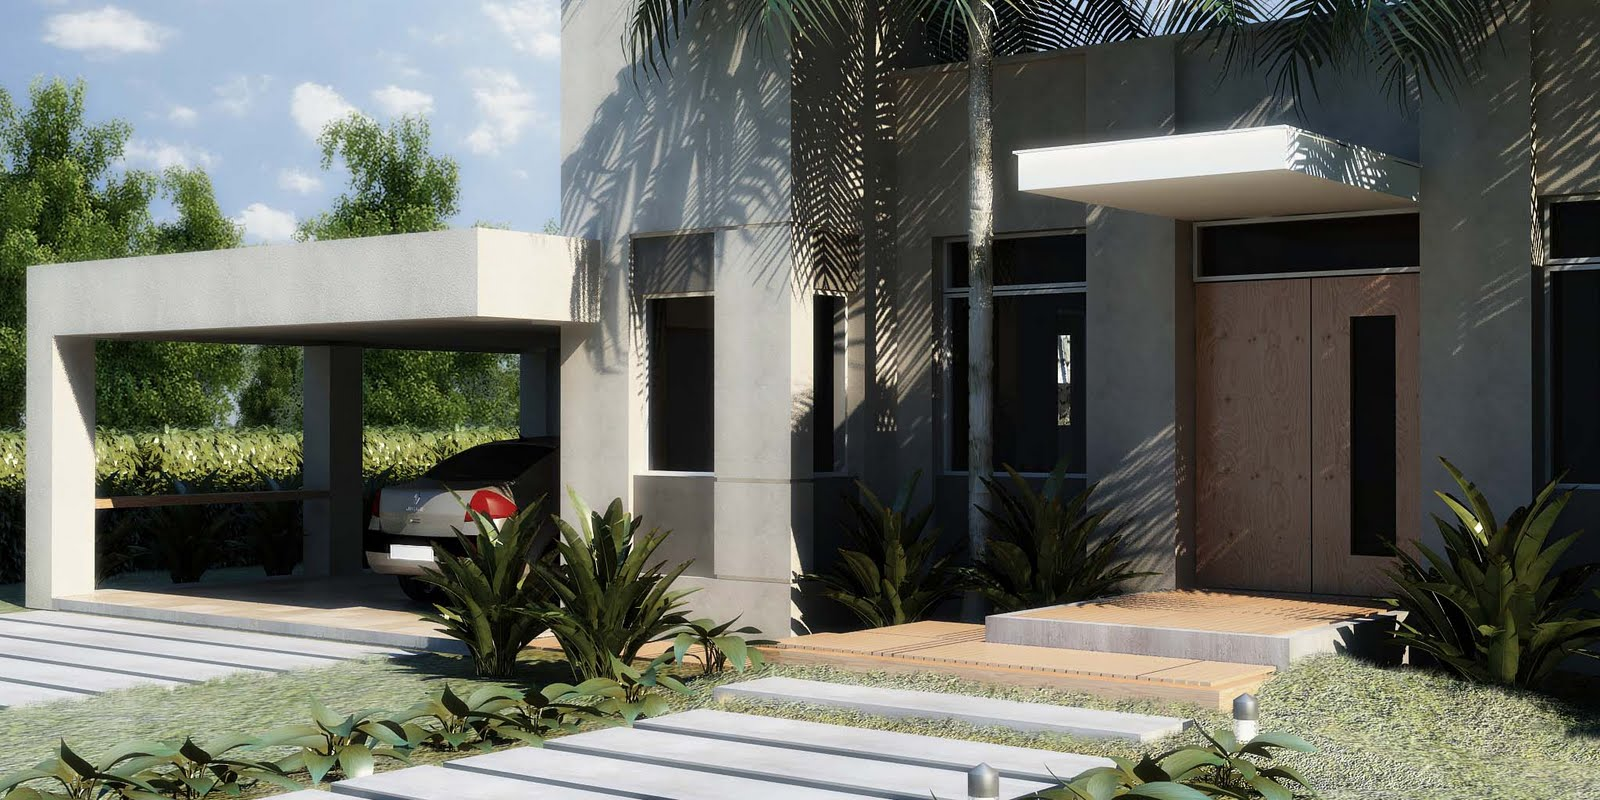 D5max render casas 3d for Render casa minimalista